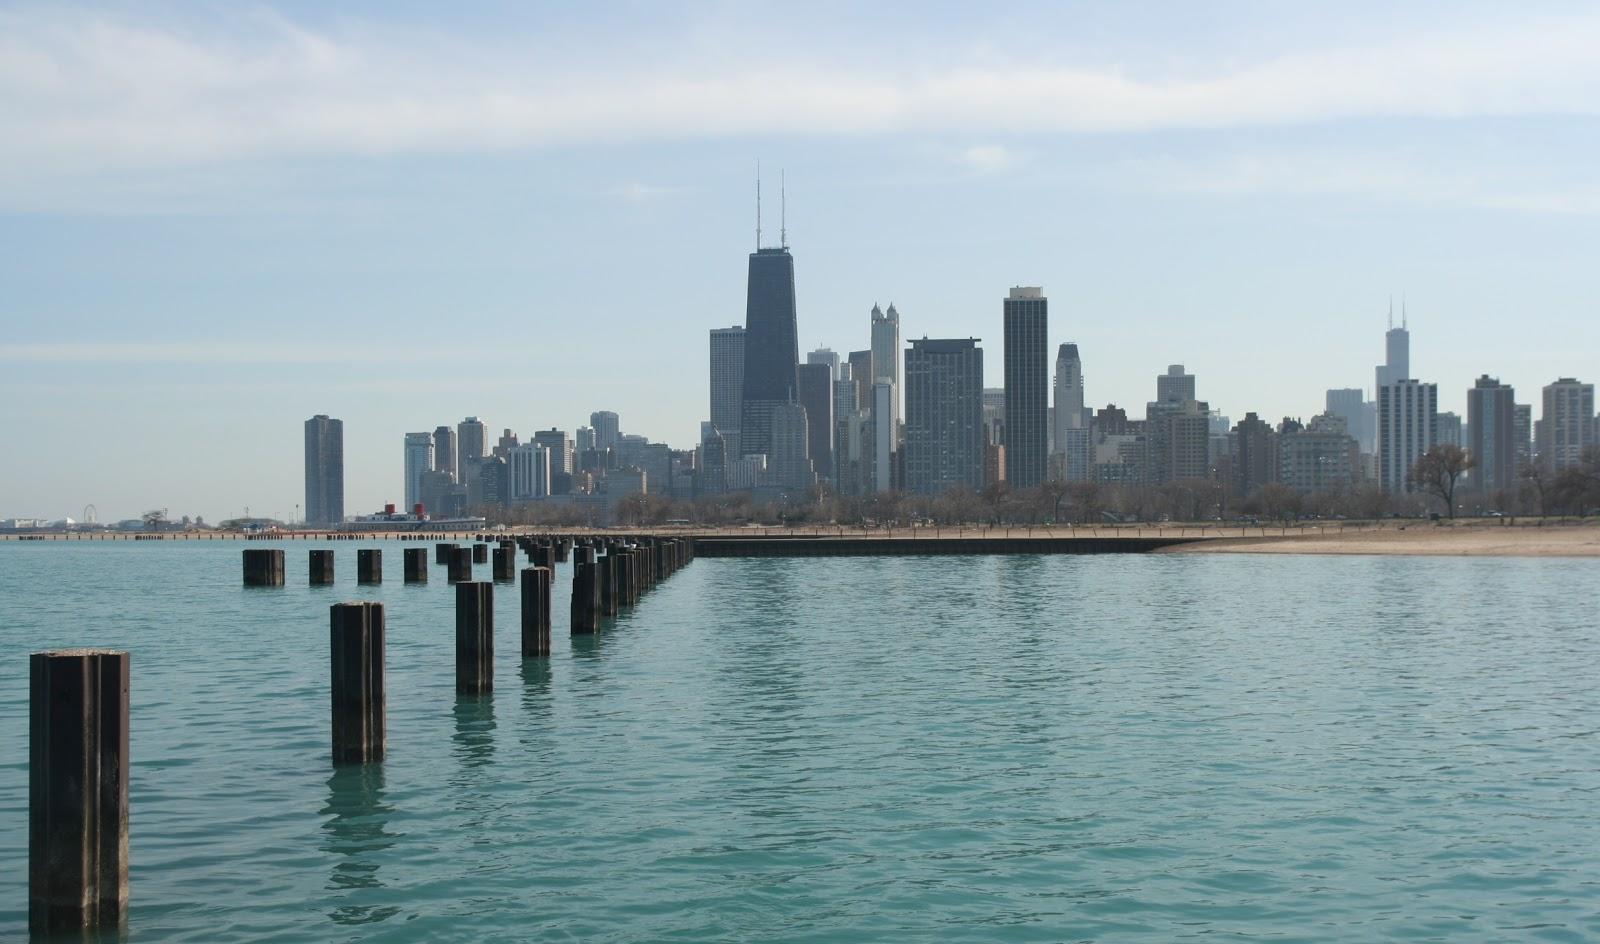 chicago weather - photo #15